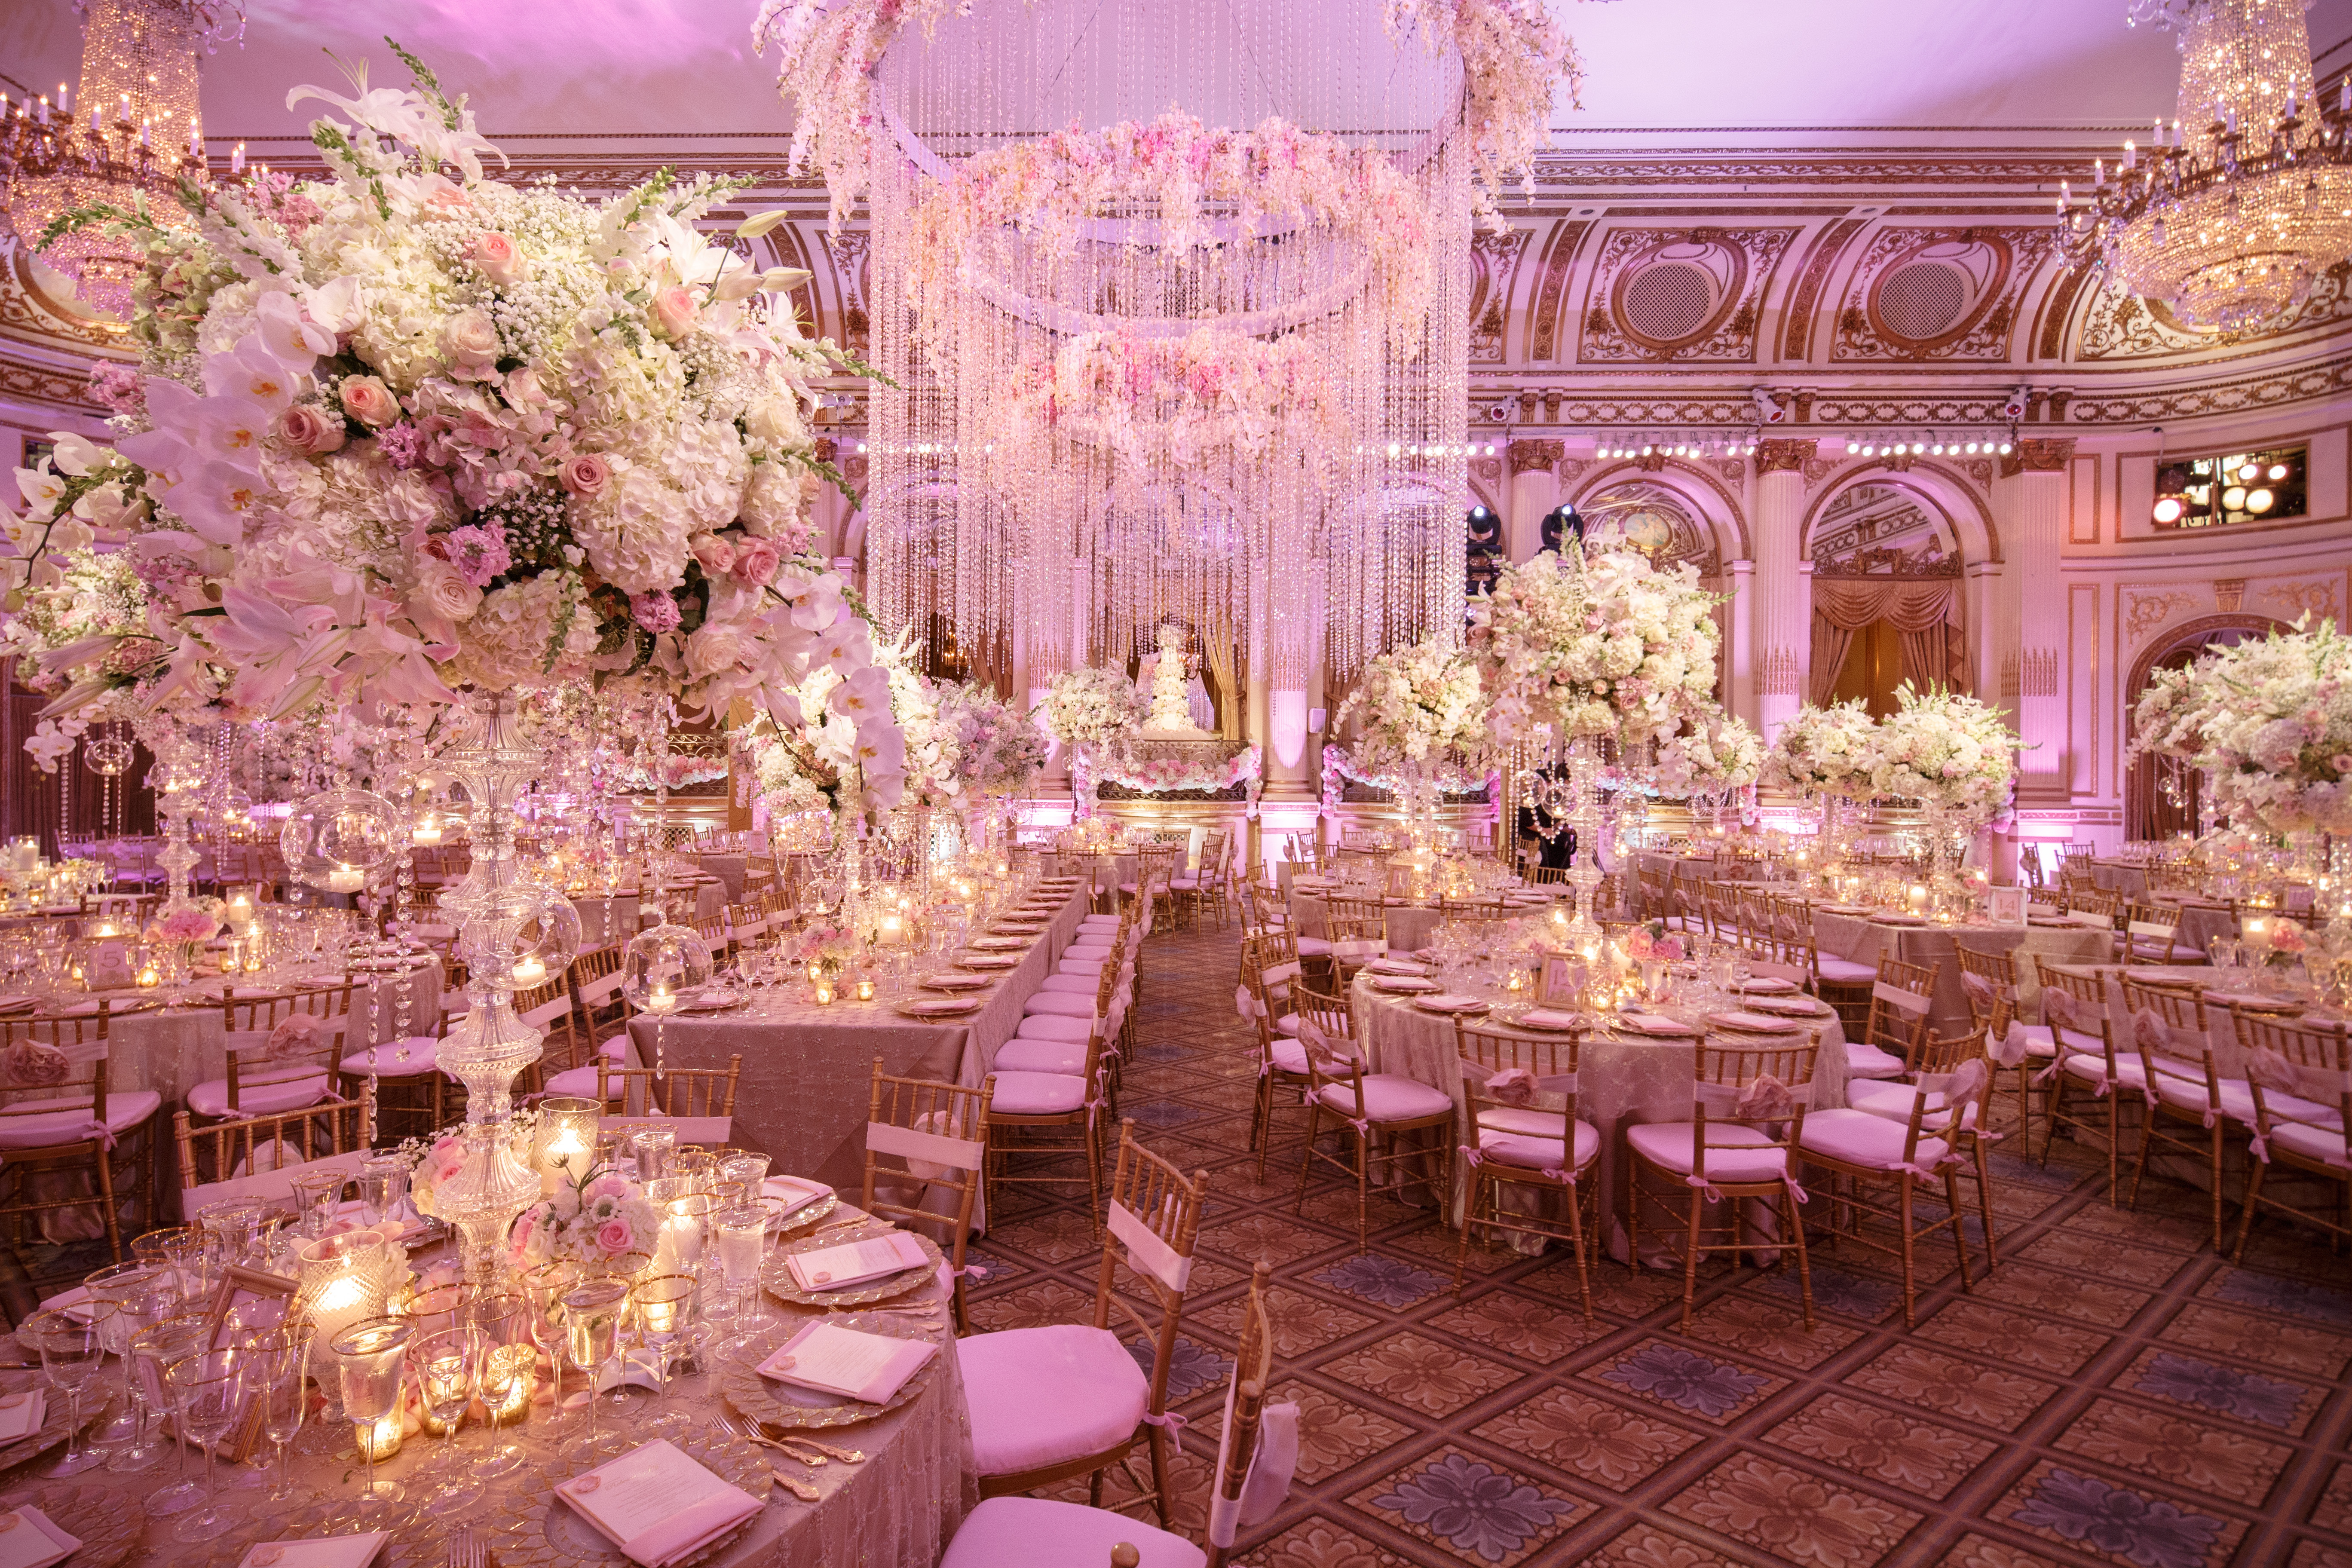 david tutera wedding planner - Wedding Decor Ideas